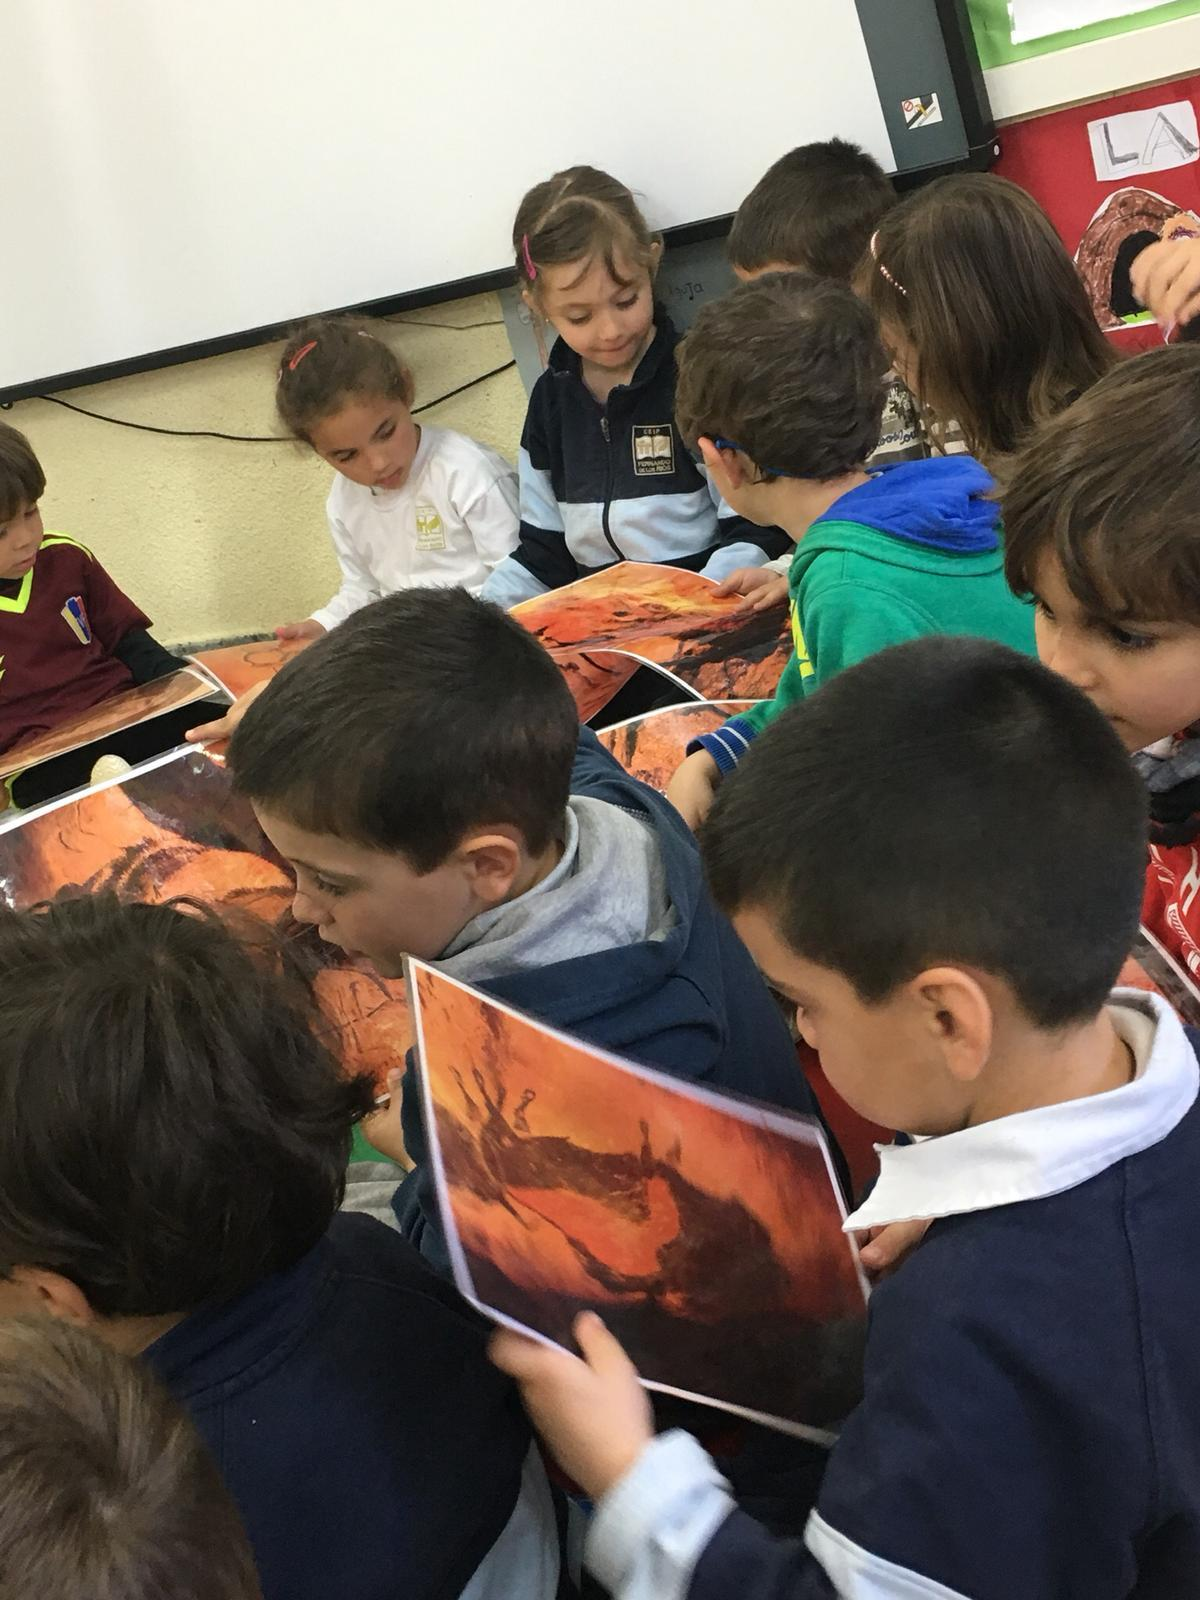 2019_03_15_Infantil 4B descubre la pintura rupestre_CEIP FDLR_Las Rozas